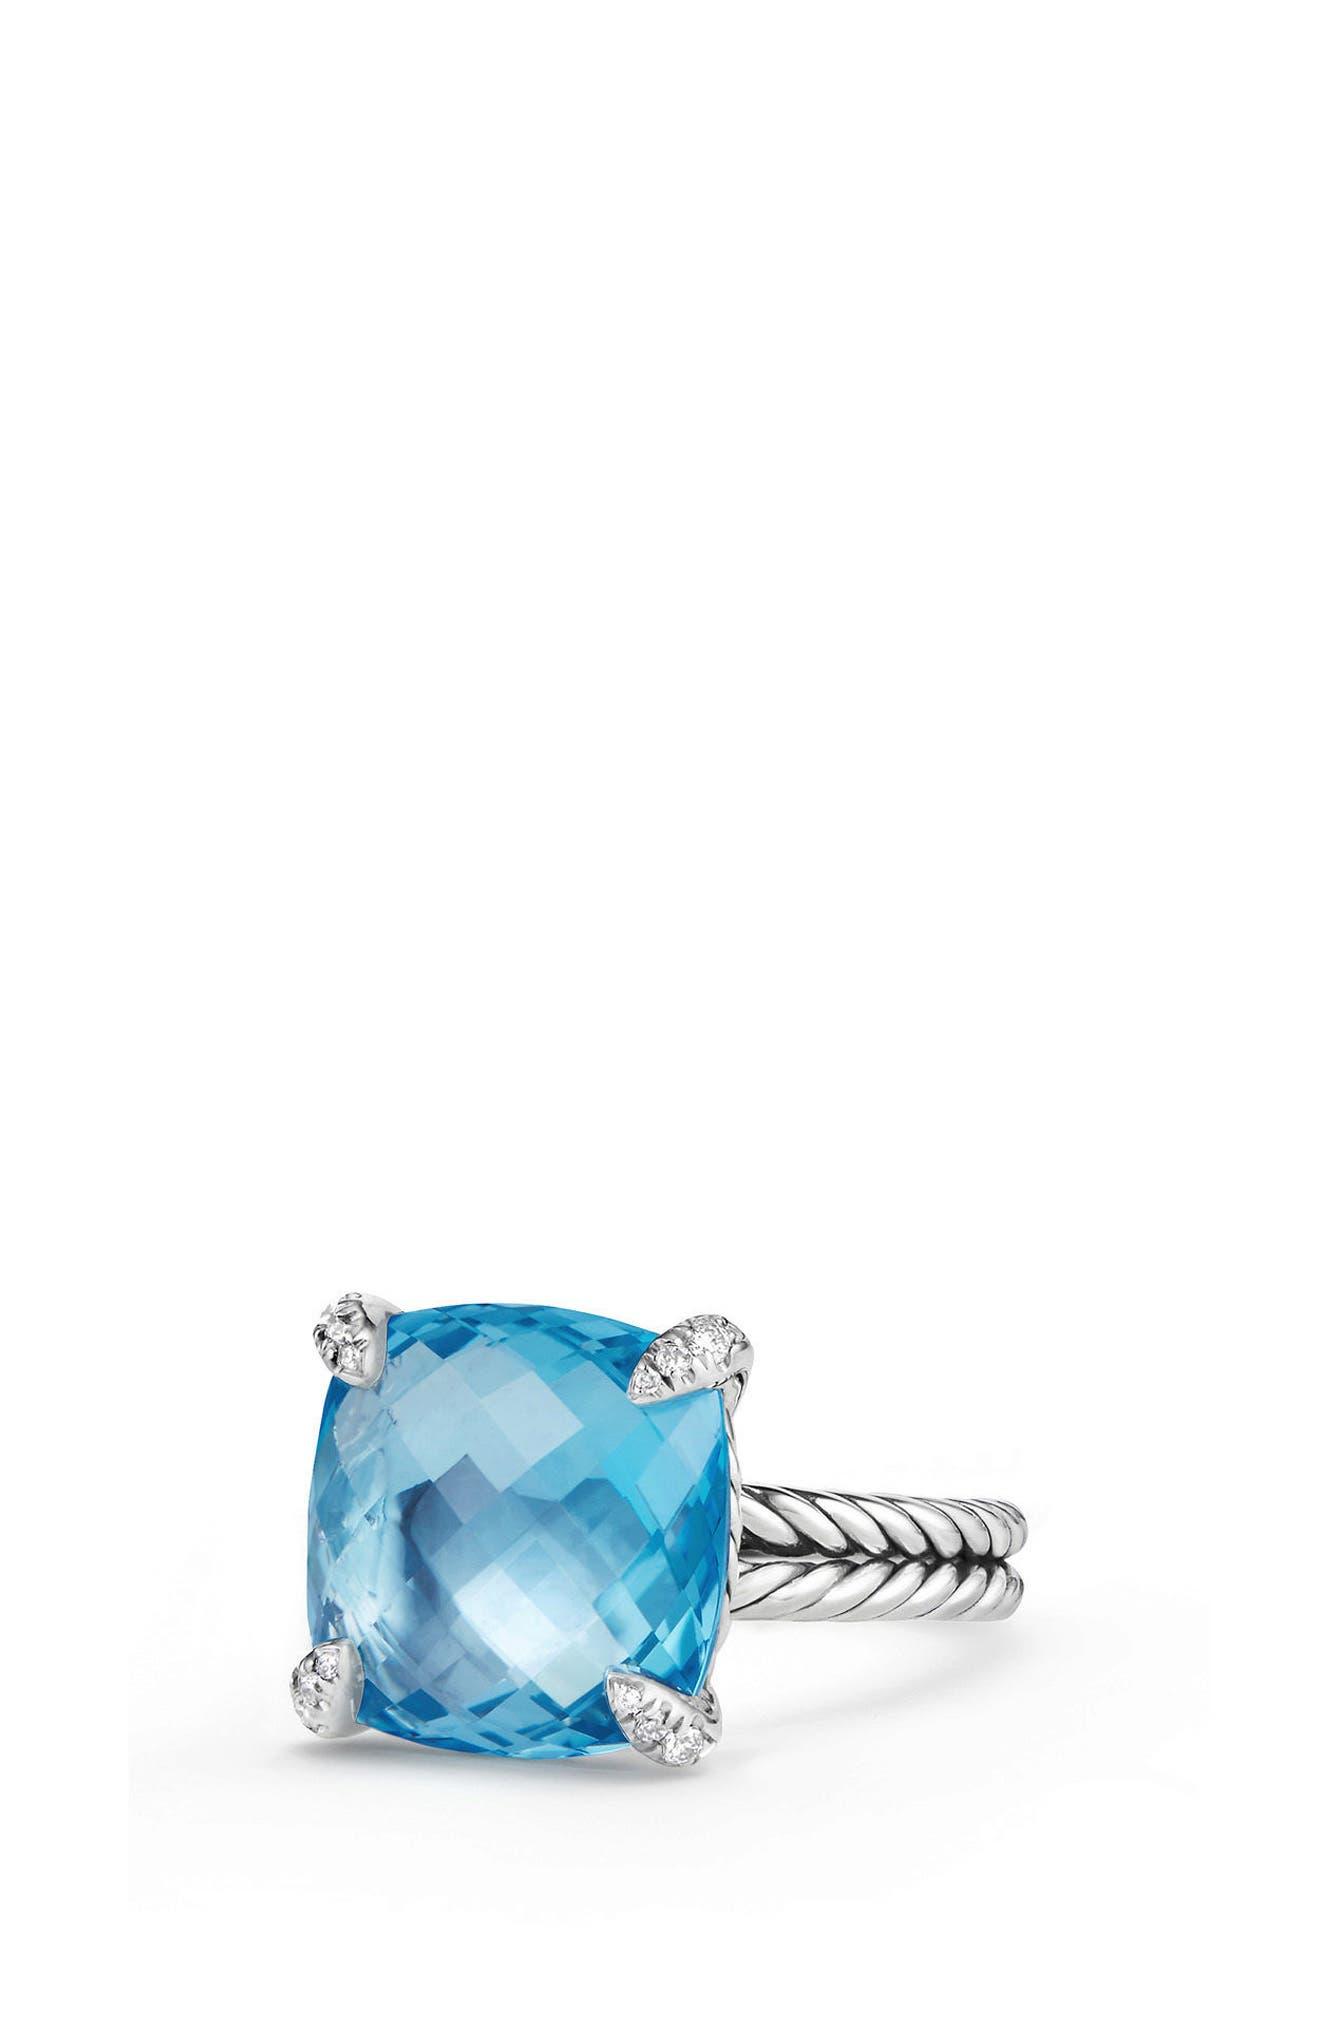 Châtelaine Ring with Semiprecious Stone & Diamonds,                         Main,                         color, Blue Topaz